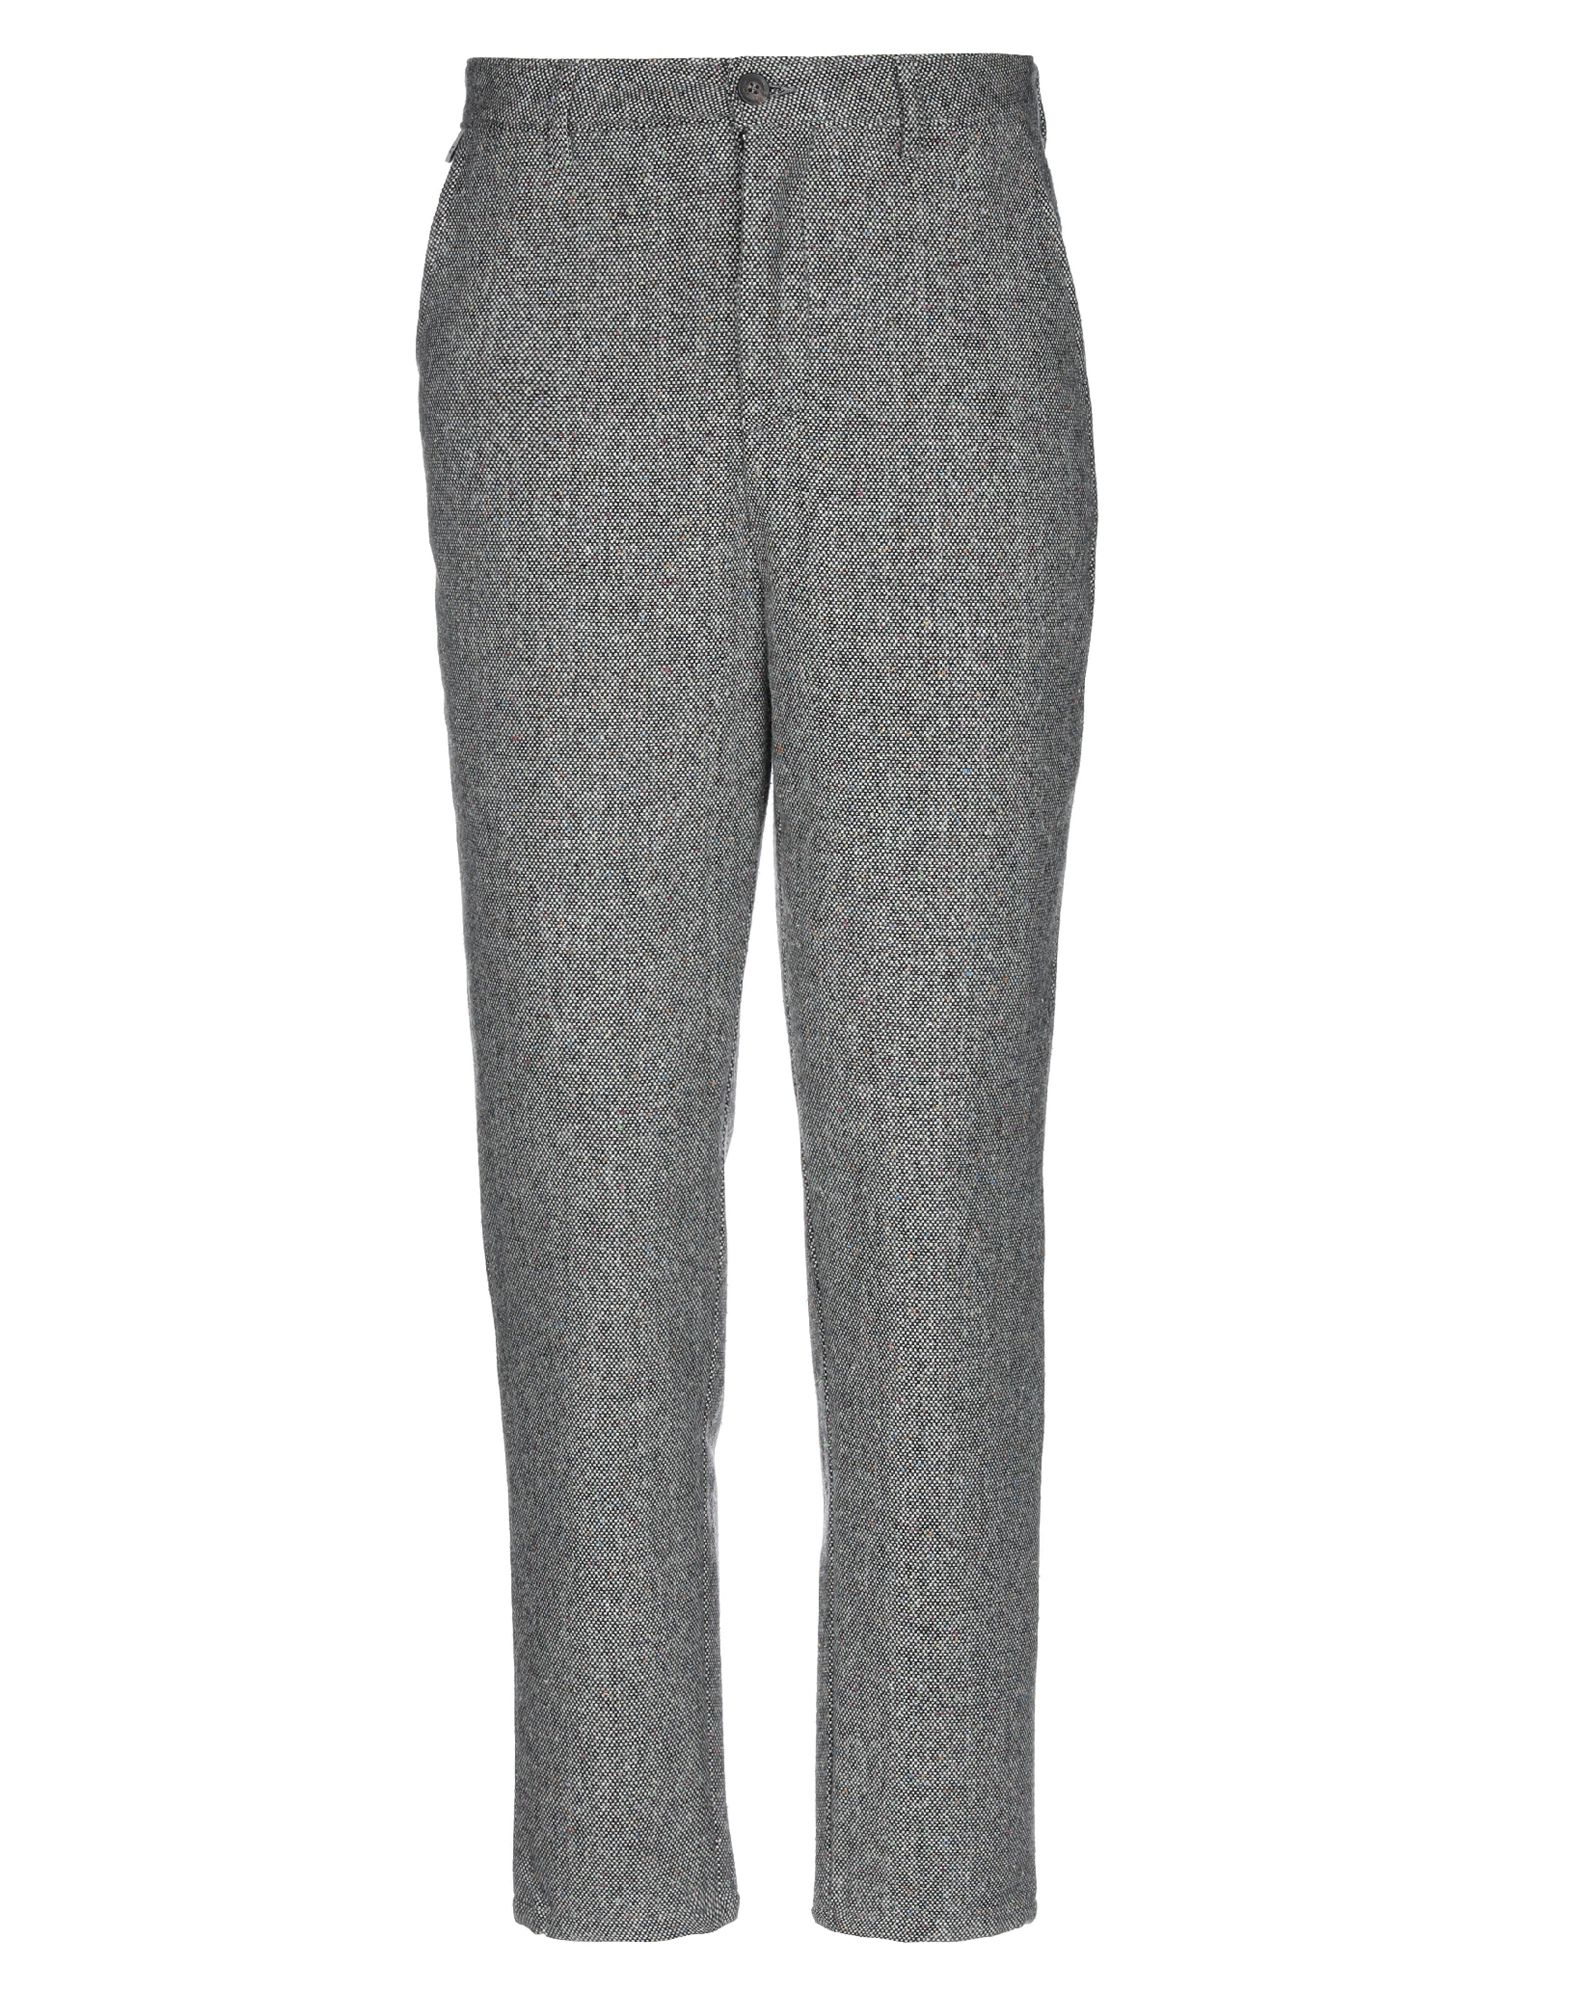 цены DERRIERE HERITAGE CO. Повседневные брюки